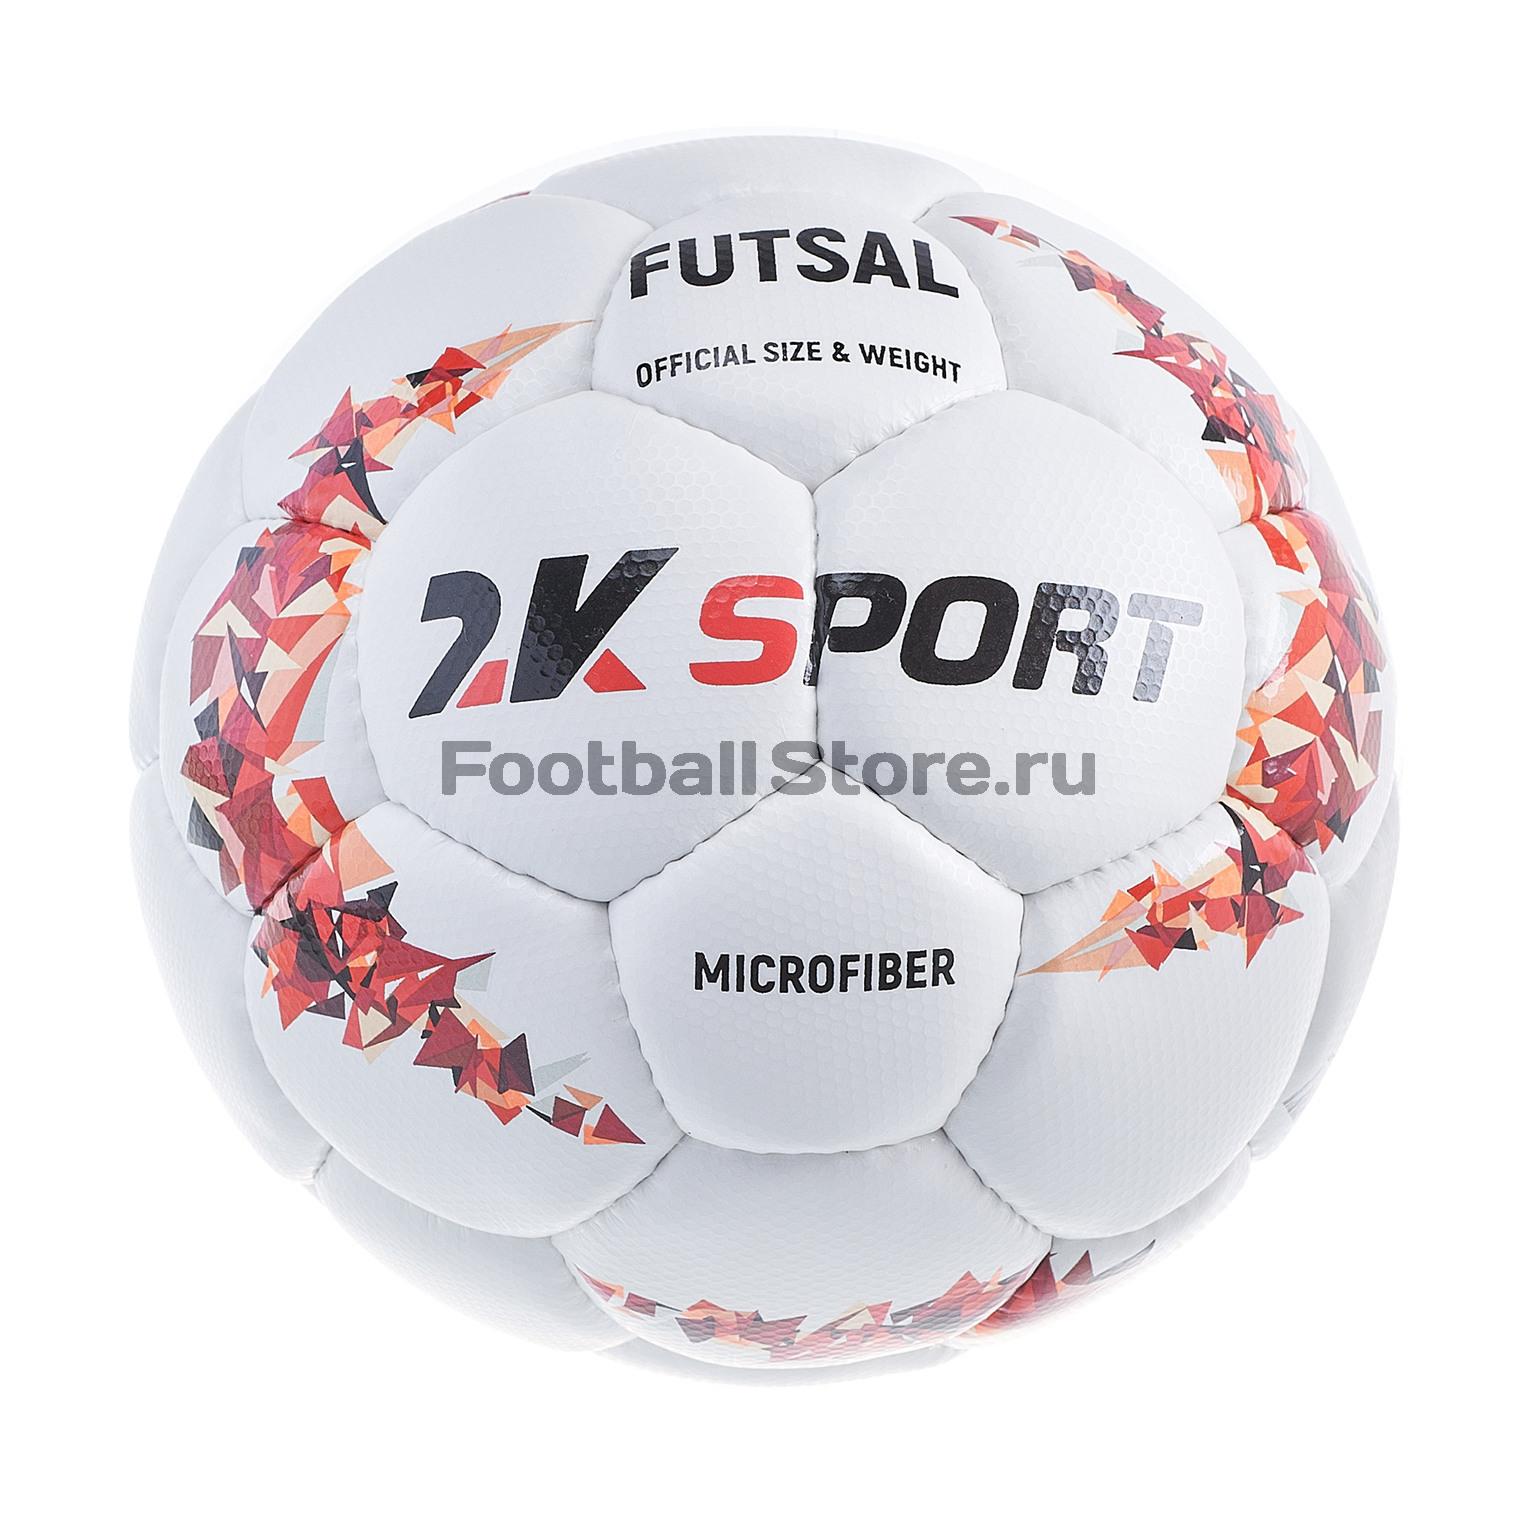 Футзальный мяч 2К Sport Crystal Elite Sala Microfiber 127093